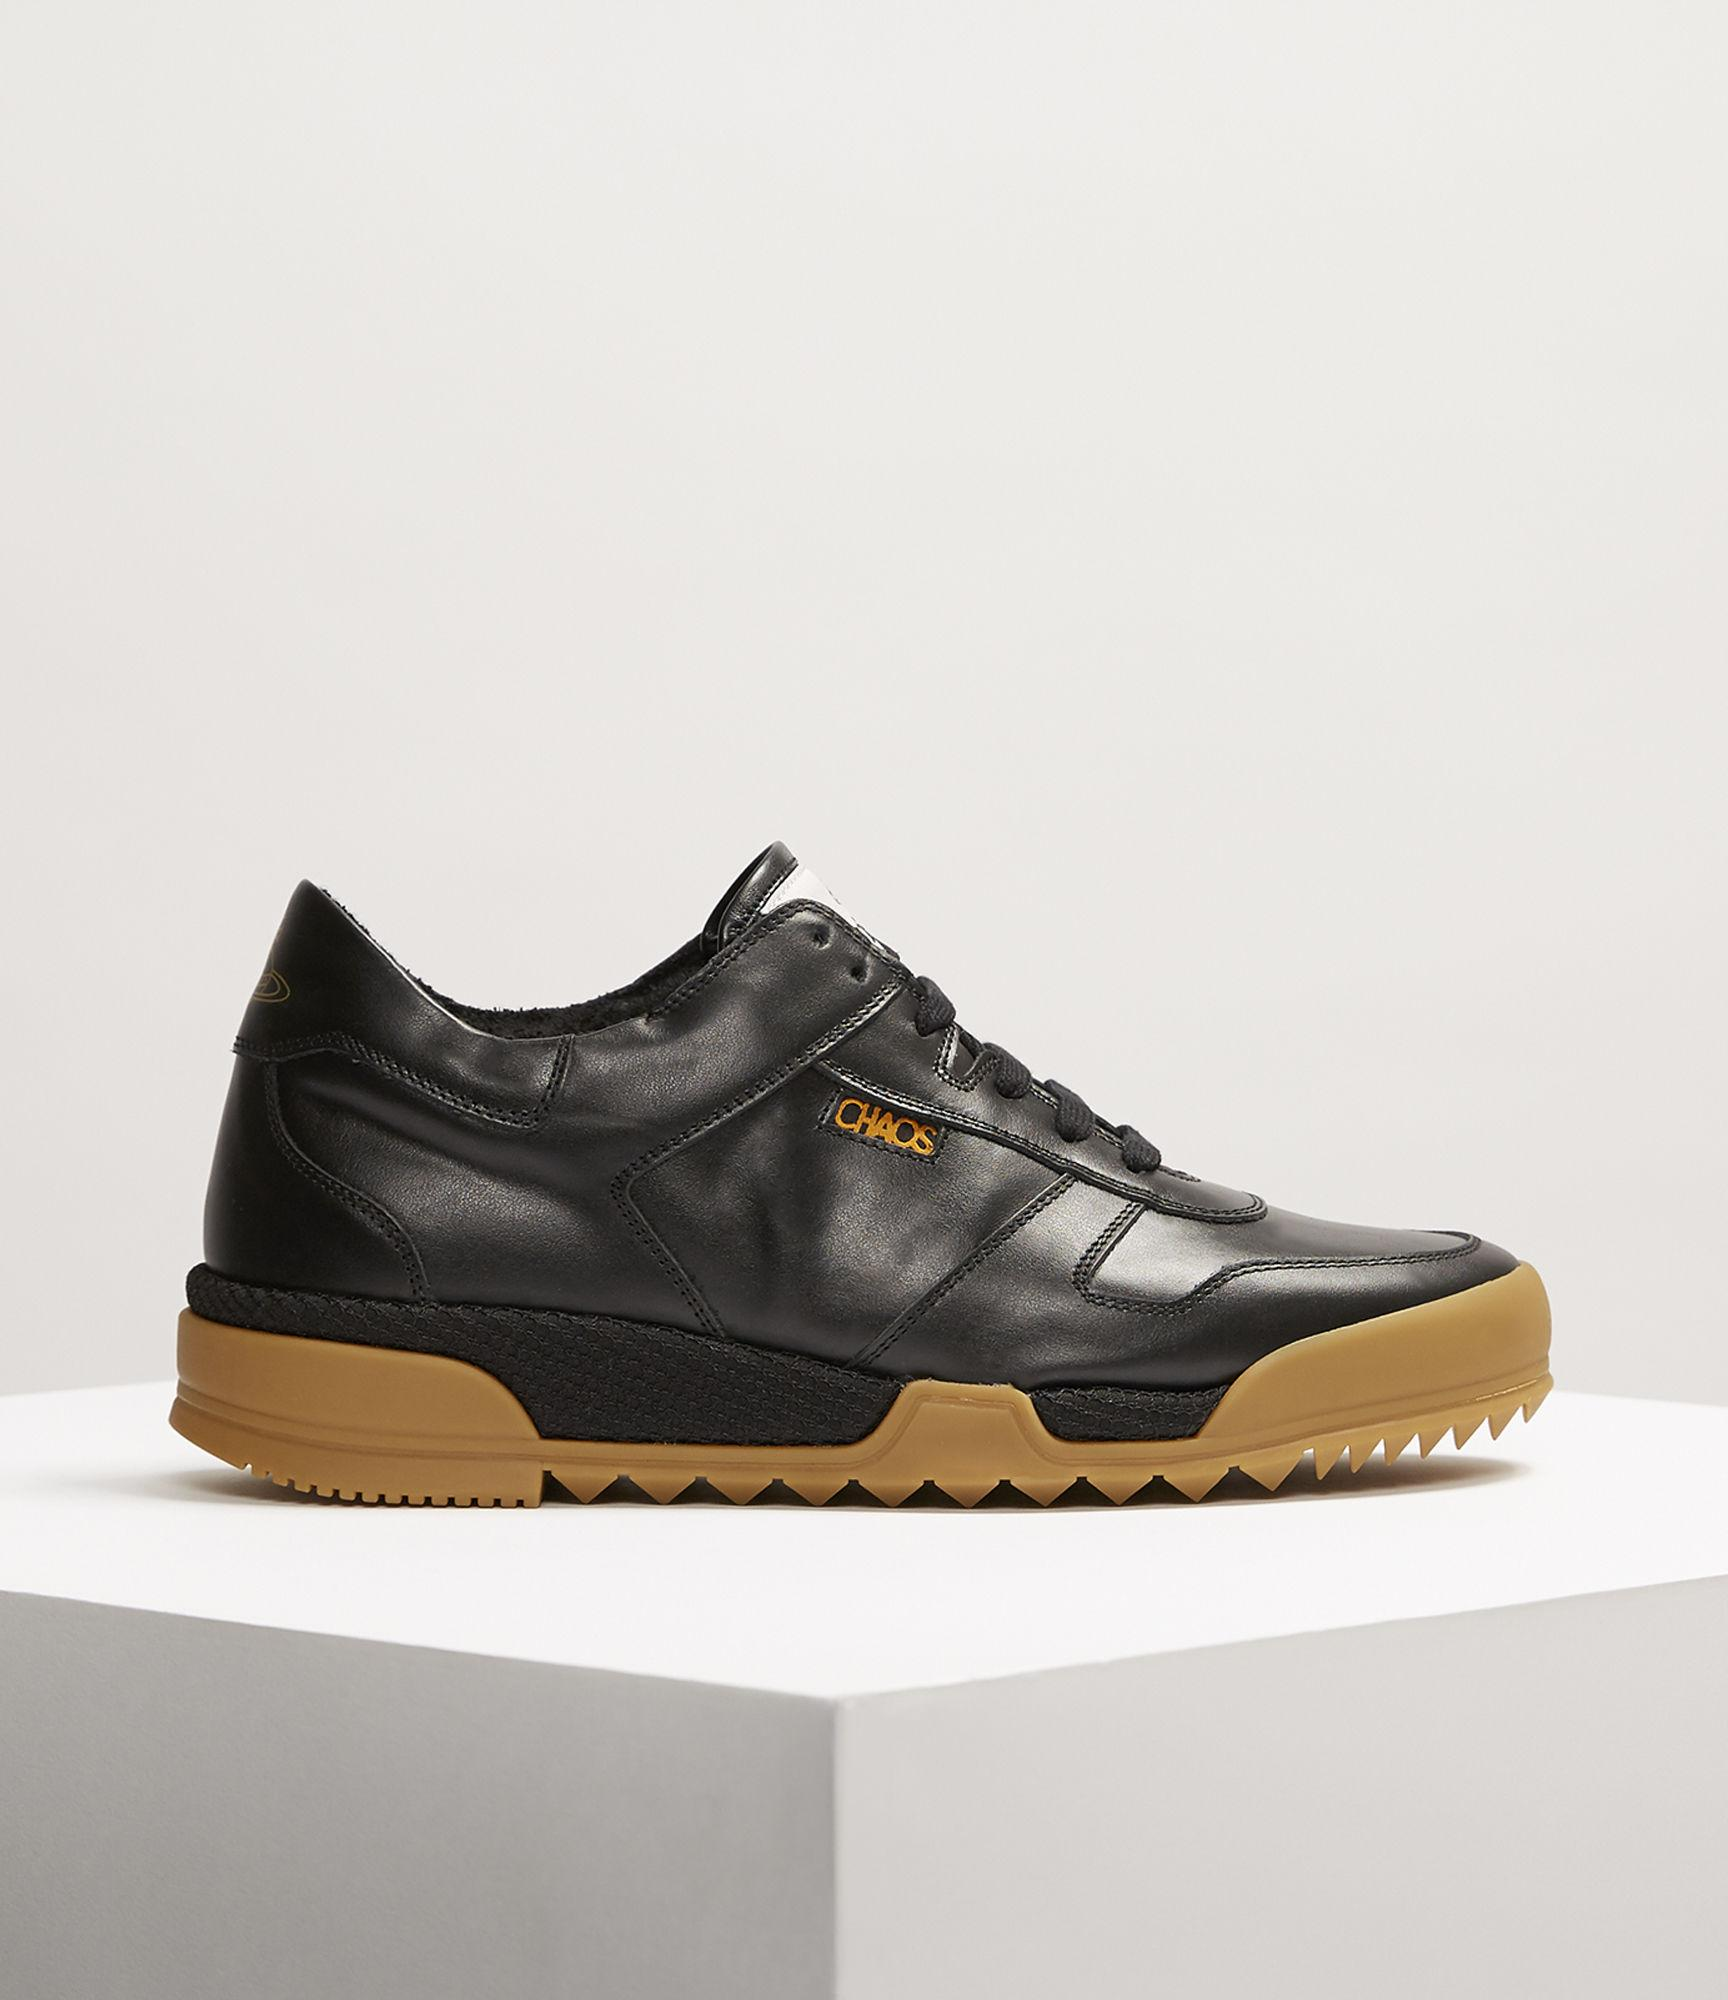 19dfa4e3d2417 Vivienne Westwood Elcho Sneakers in Black for Men - Lyst